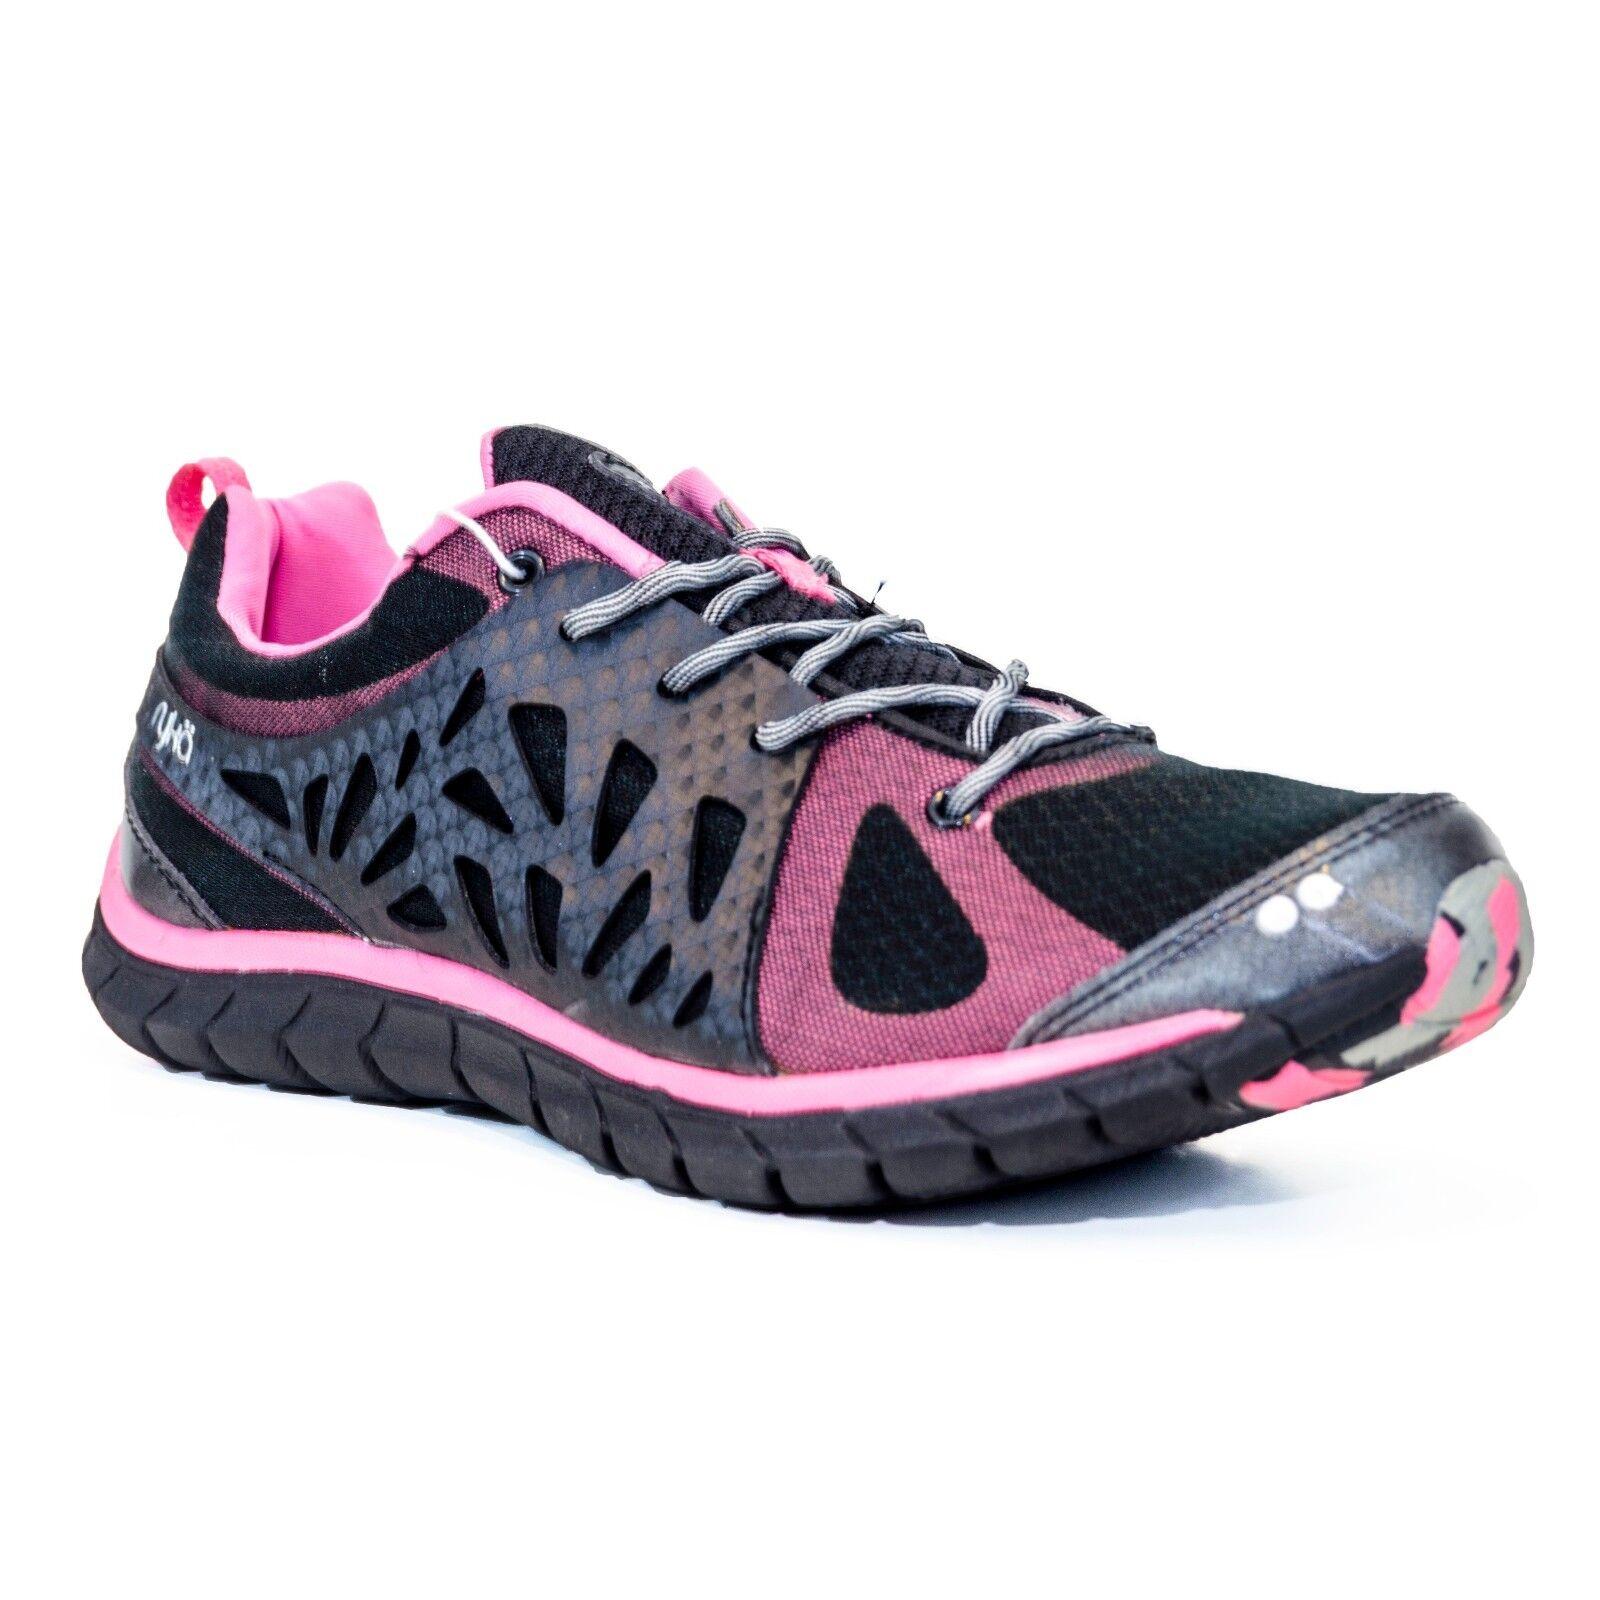 Ryka Precision Black / Pink Women's Training Shoe Size 11 Medium B,M New in Box